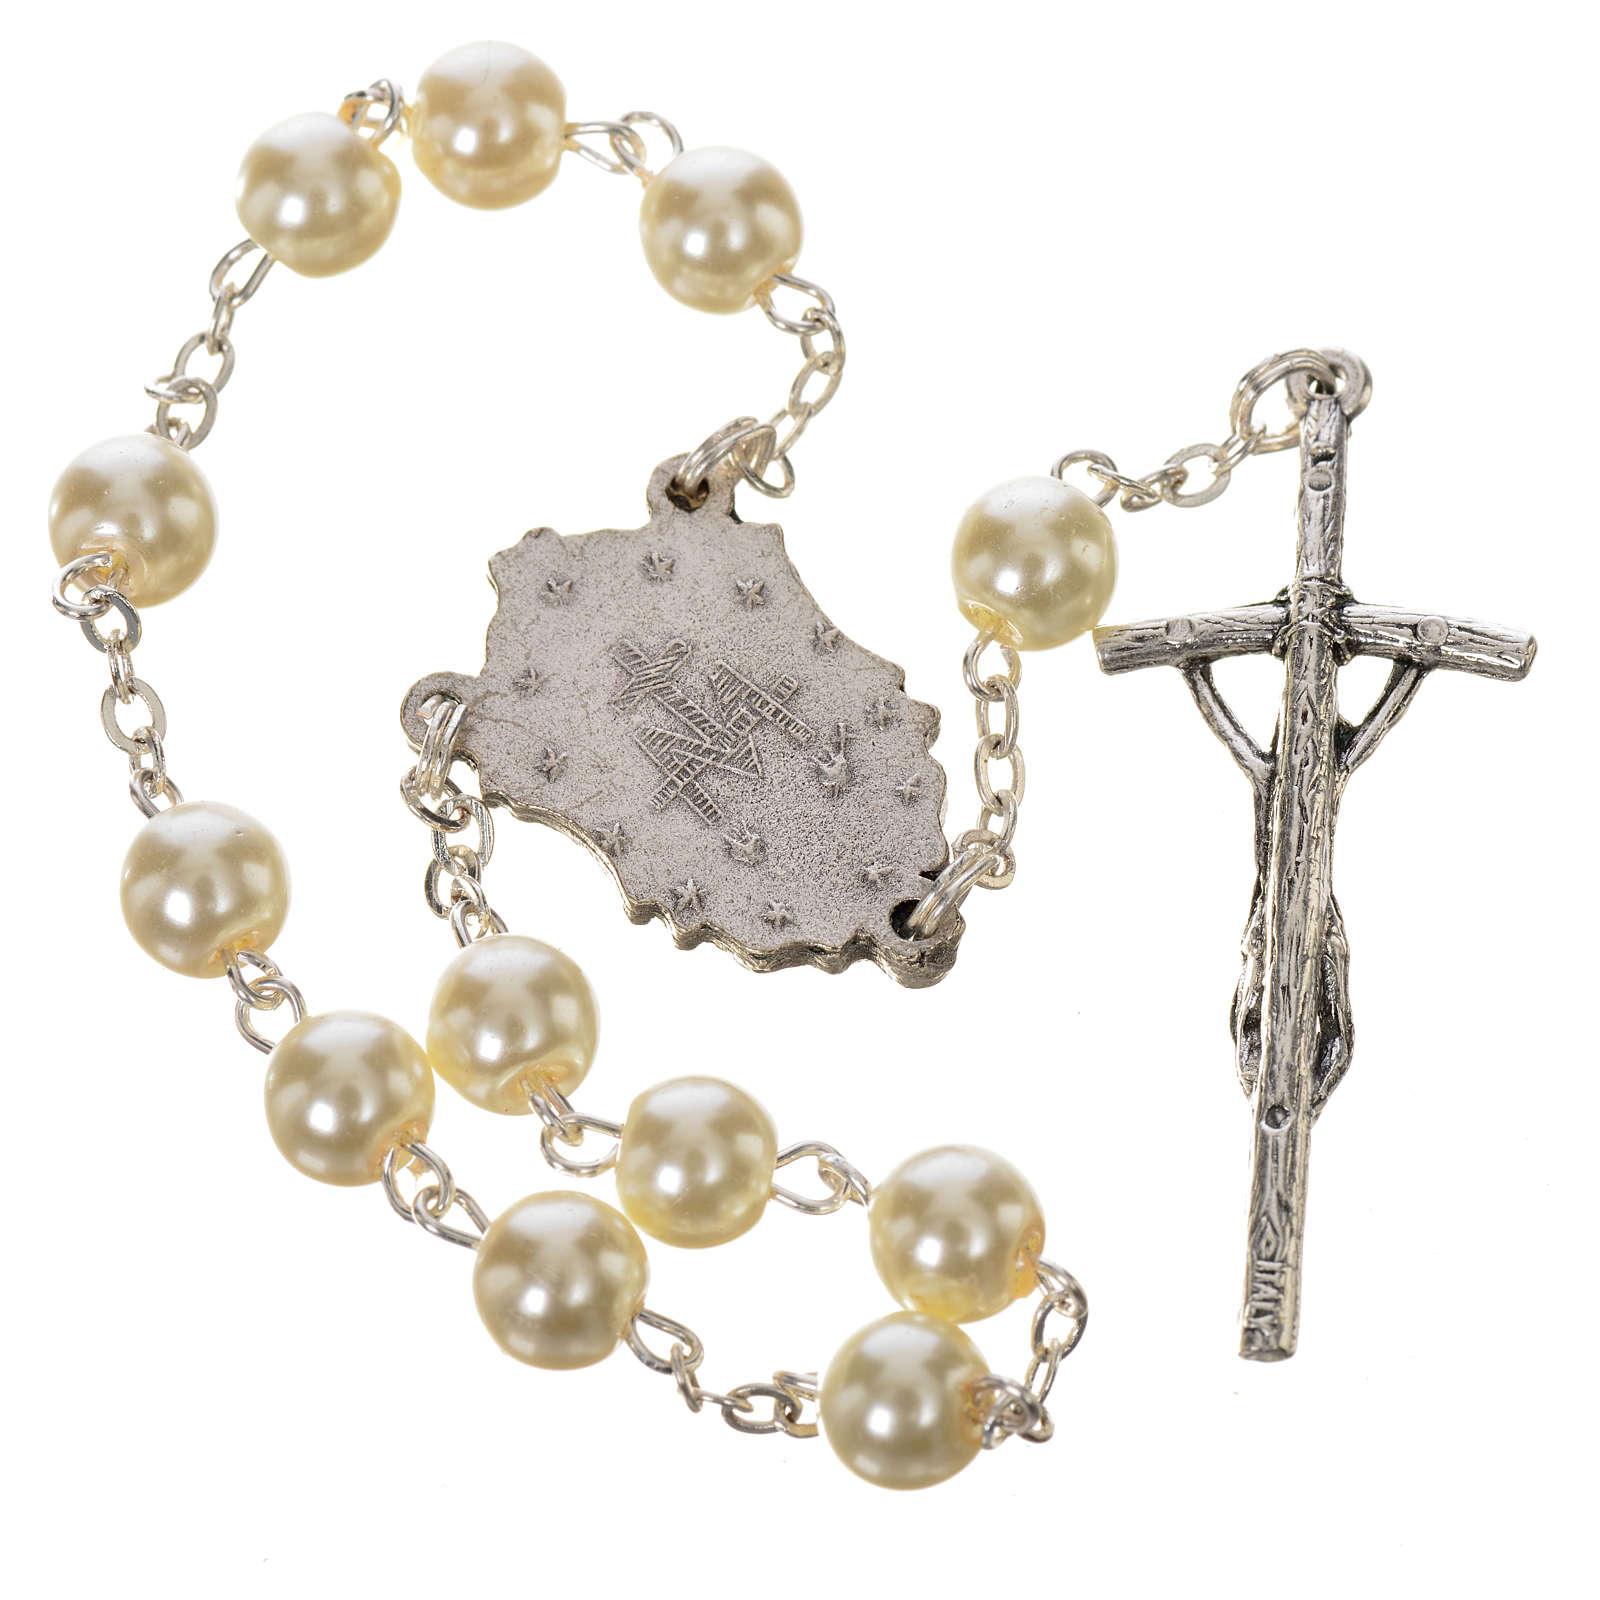 Trisagio Idente blanc croix pastorale médaille Miraculeuse 4